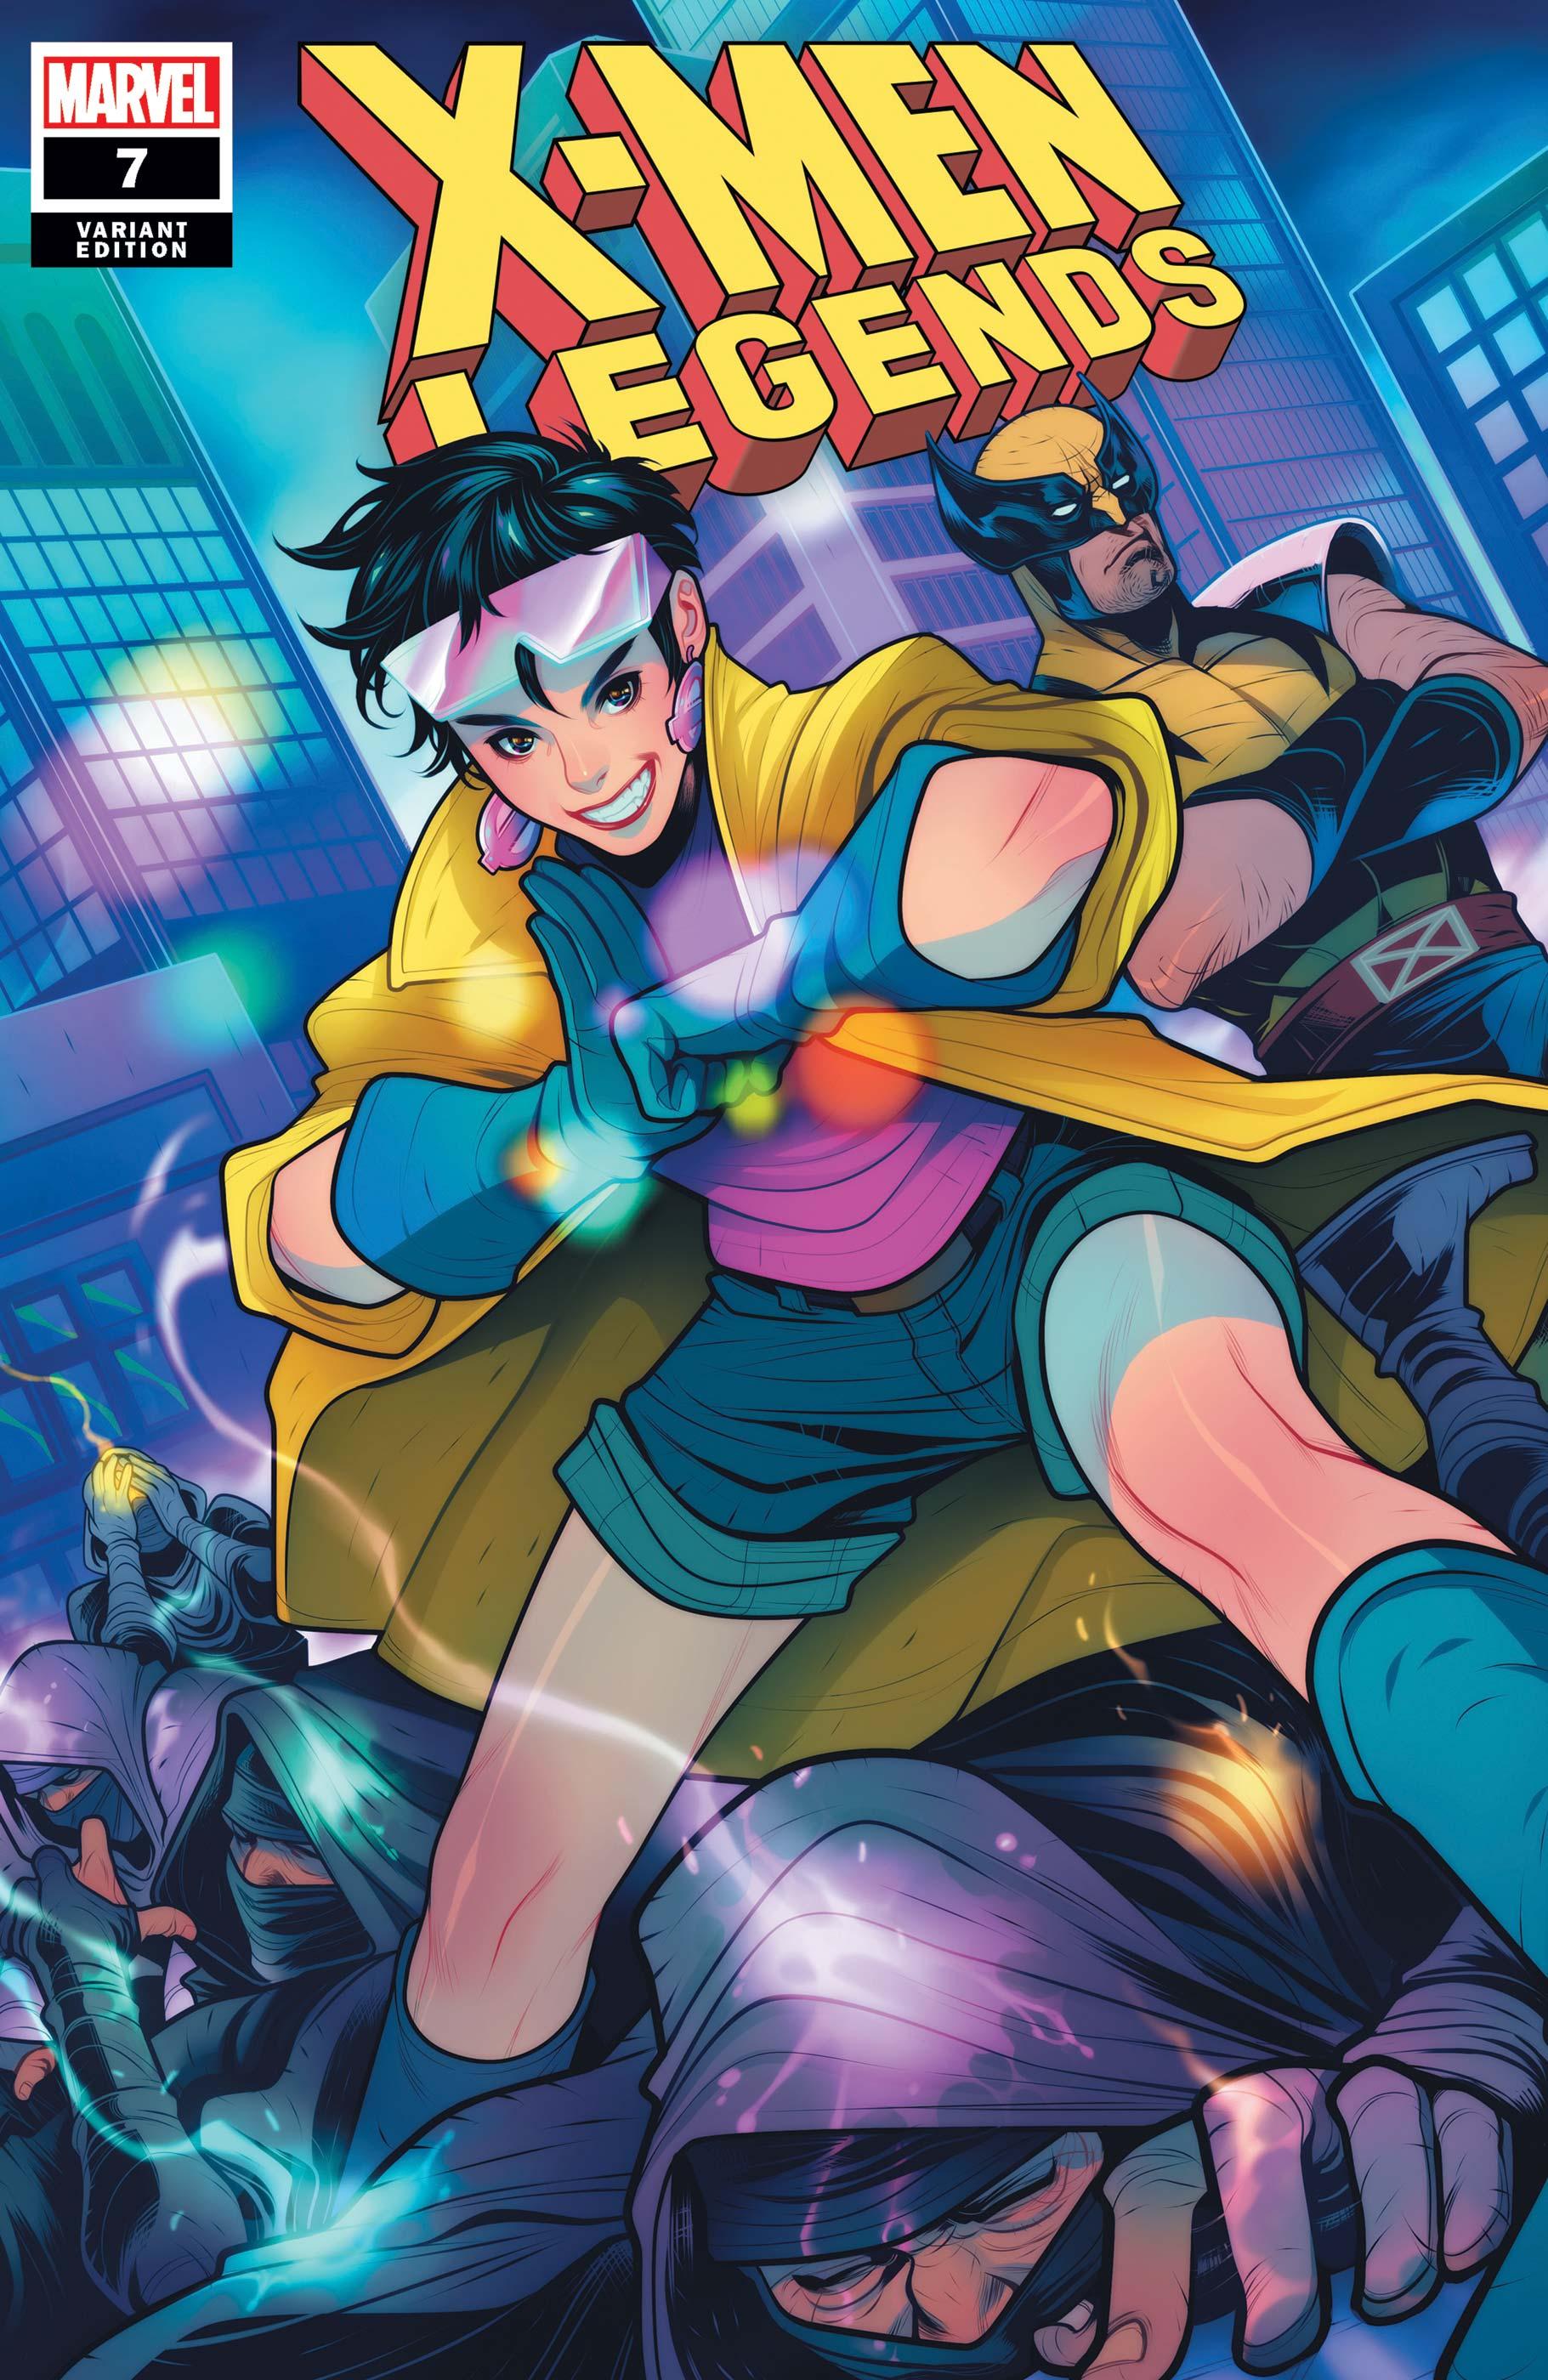 X-Men Legends (2021) #7 (Variant)